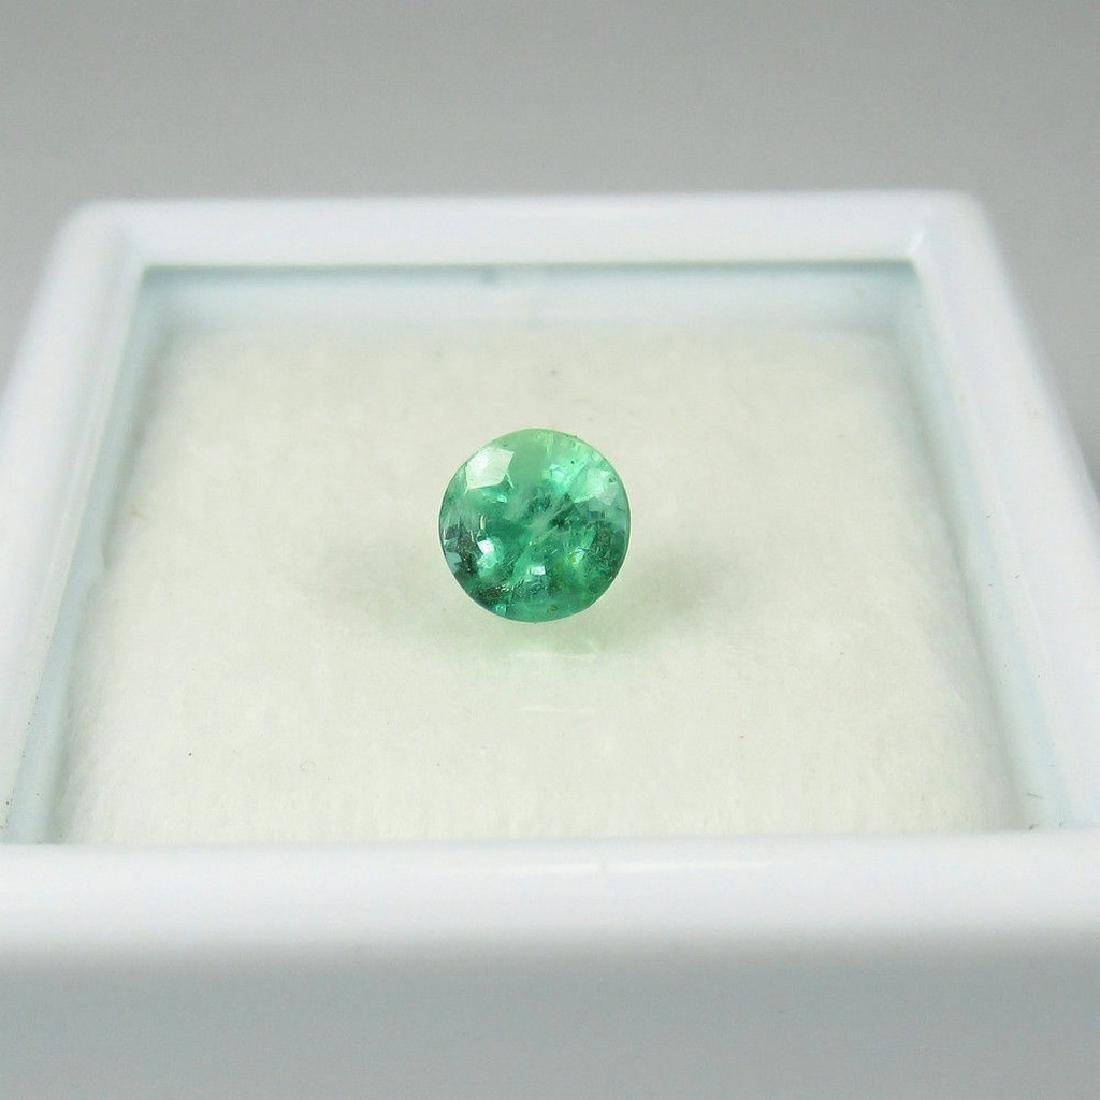 0.45 Ct Genuine Loose Zambian Emerald 4.8 mm Round cut